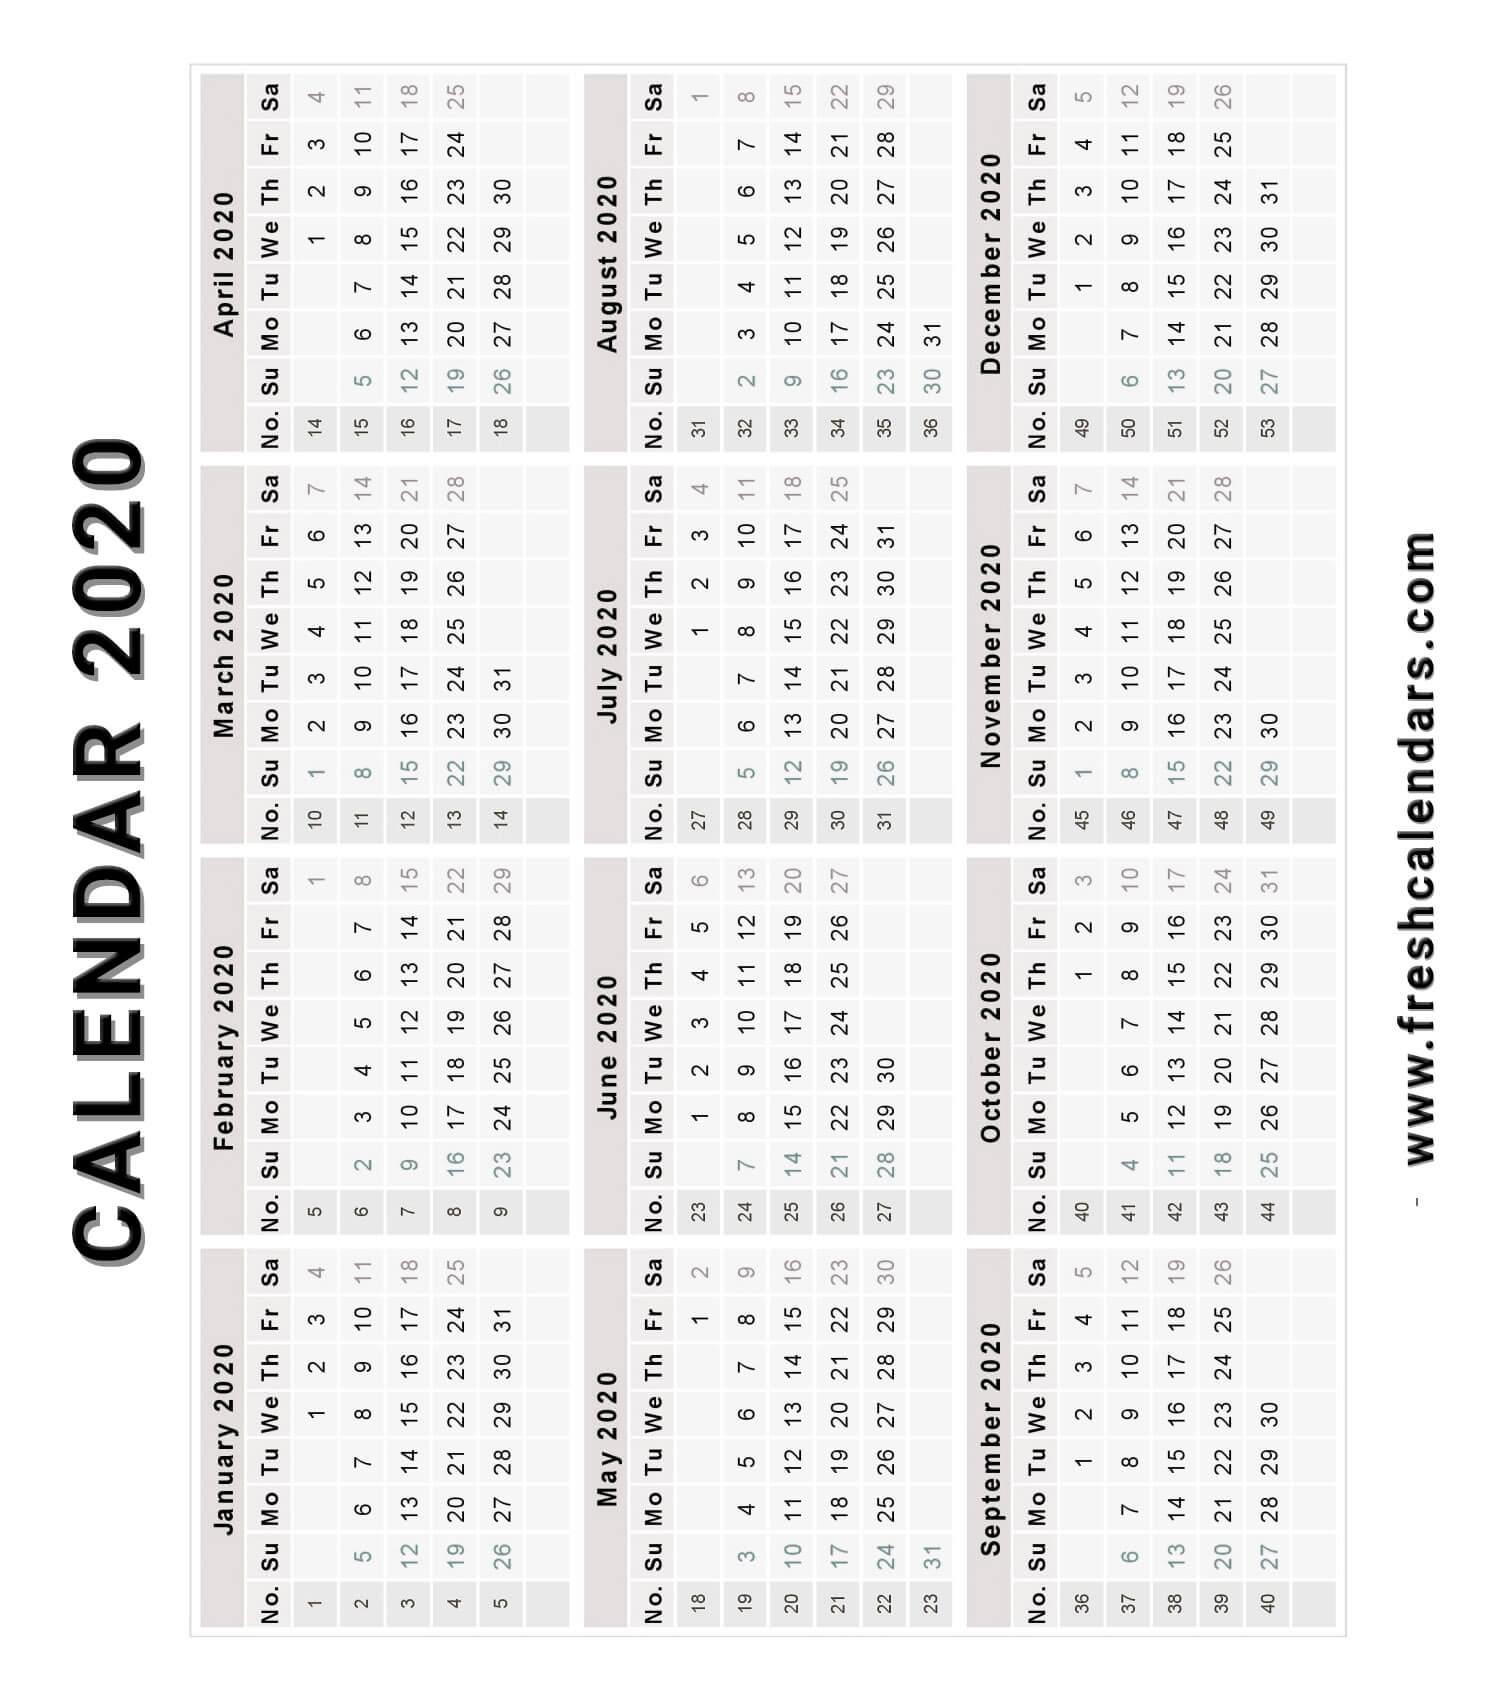 Bangla Calendar 2019 Pdf  Google Search throughout Uc Berkeley Calendar 2020-2020